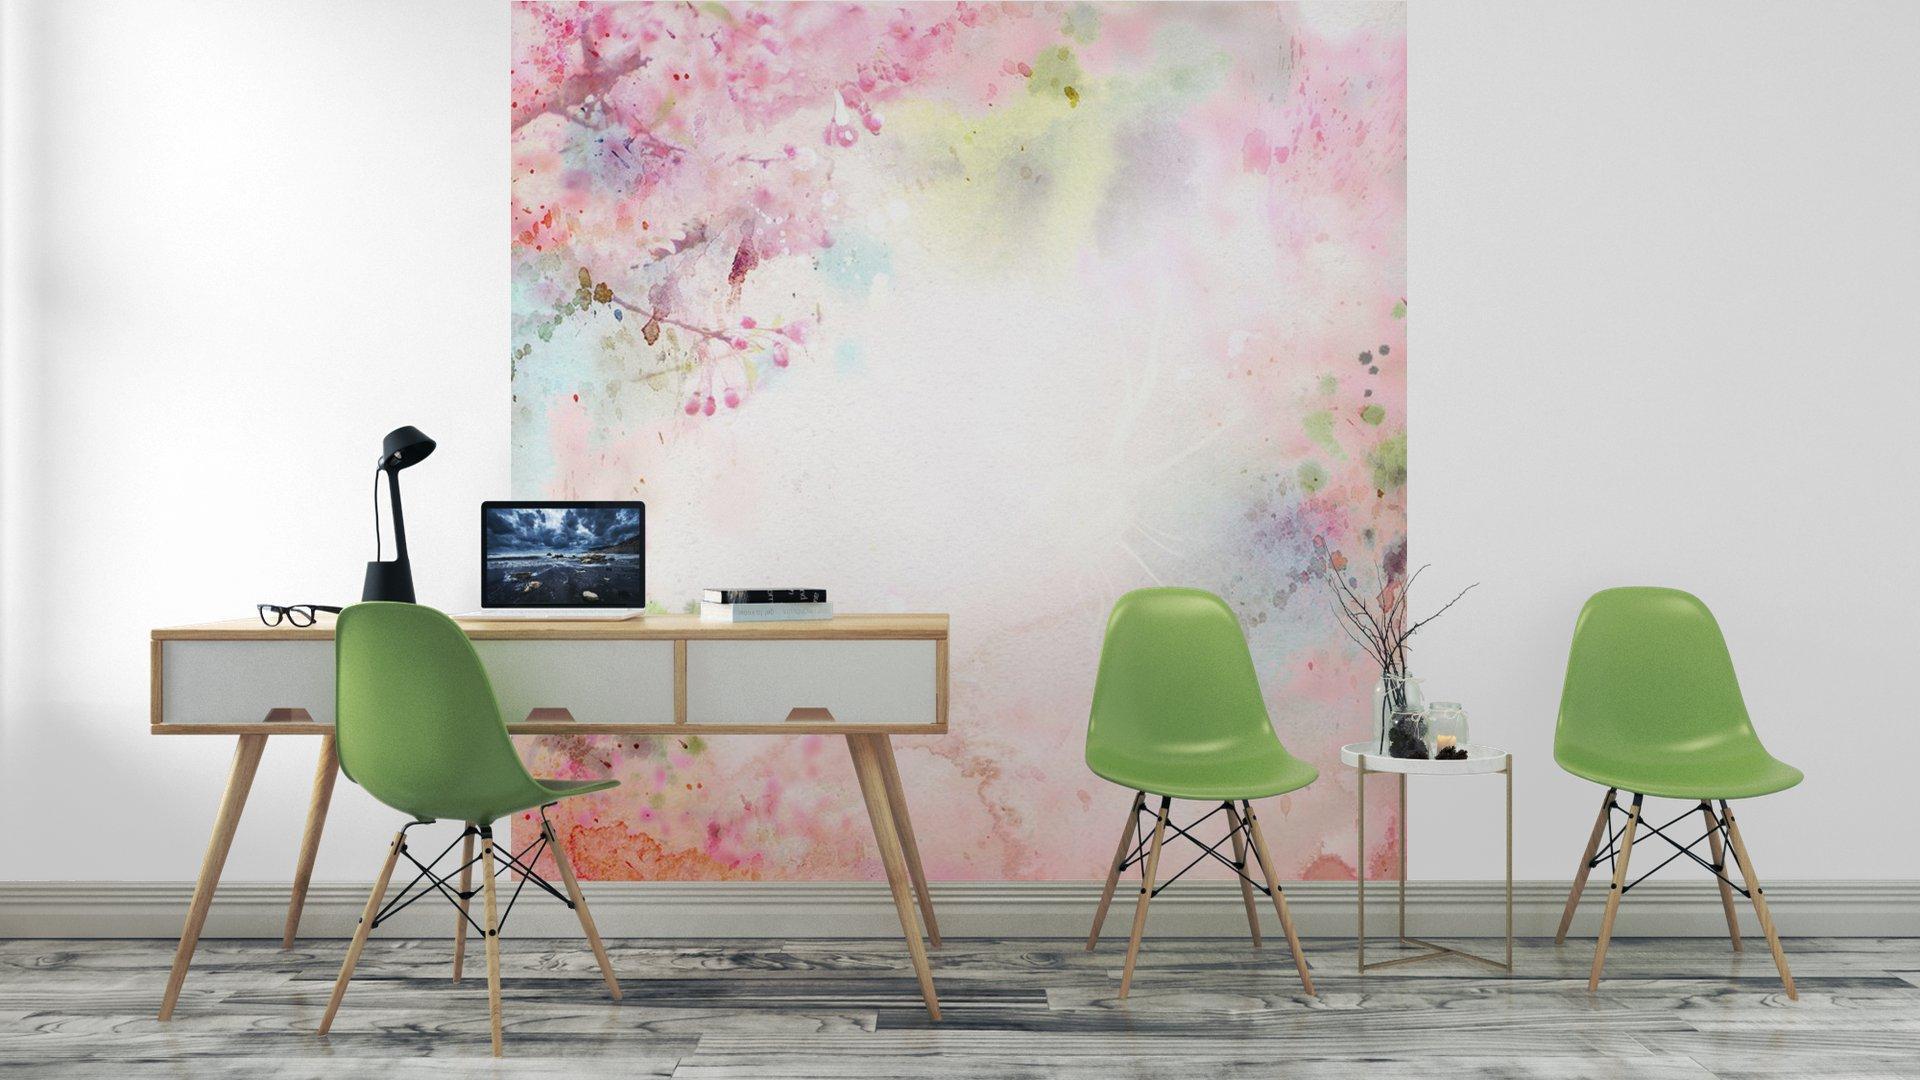 ACUARELA DE FONDO ESCÉNICO COMPOSICIÓN FLORAL SAKURA4 - Fotomural Tapiz Composición Floral Sakura Tipo Acuarela